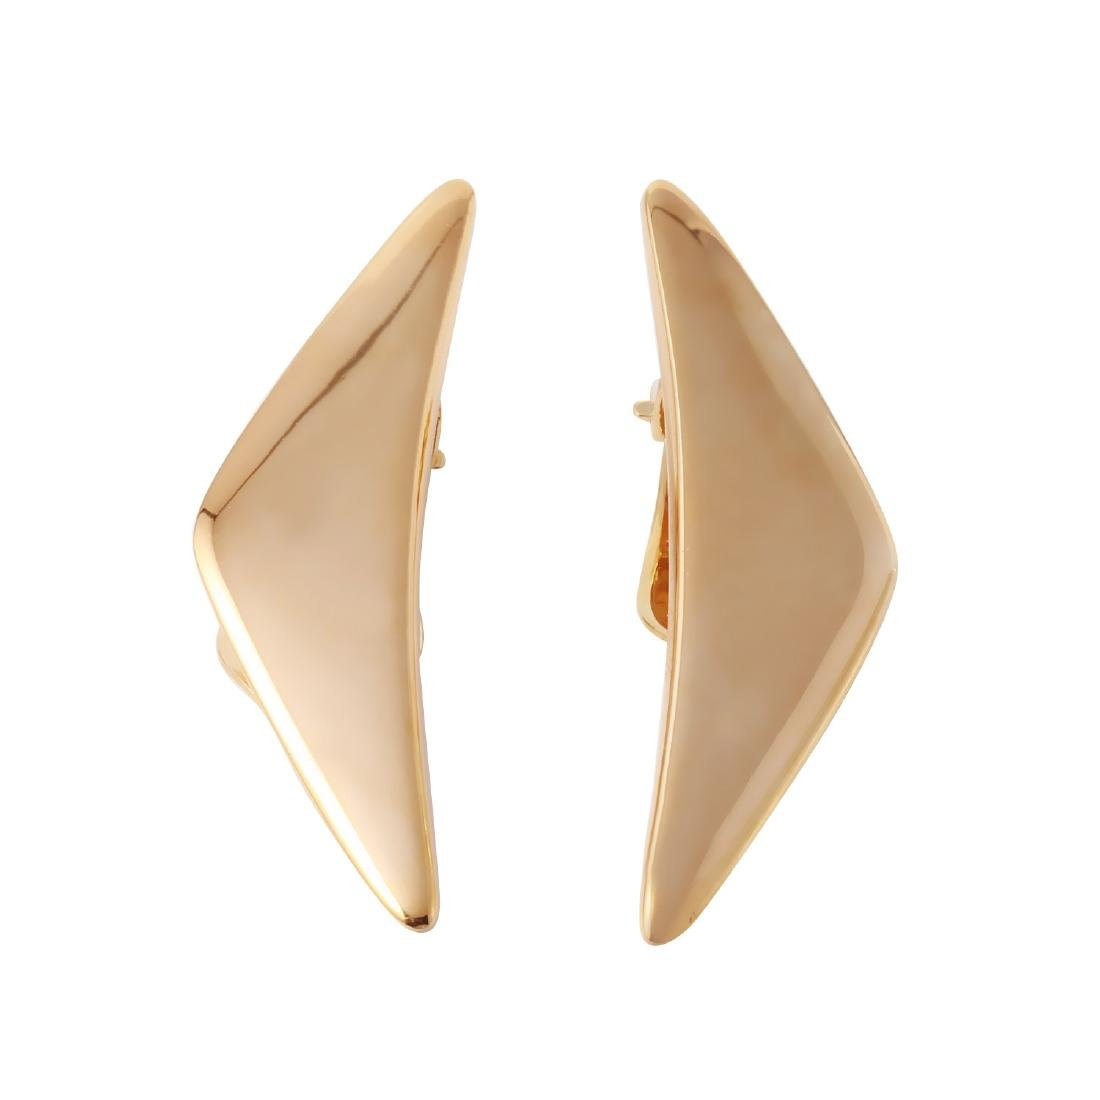 Hans Hansen 14KT Yellow Gold Clip-On Earrings